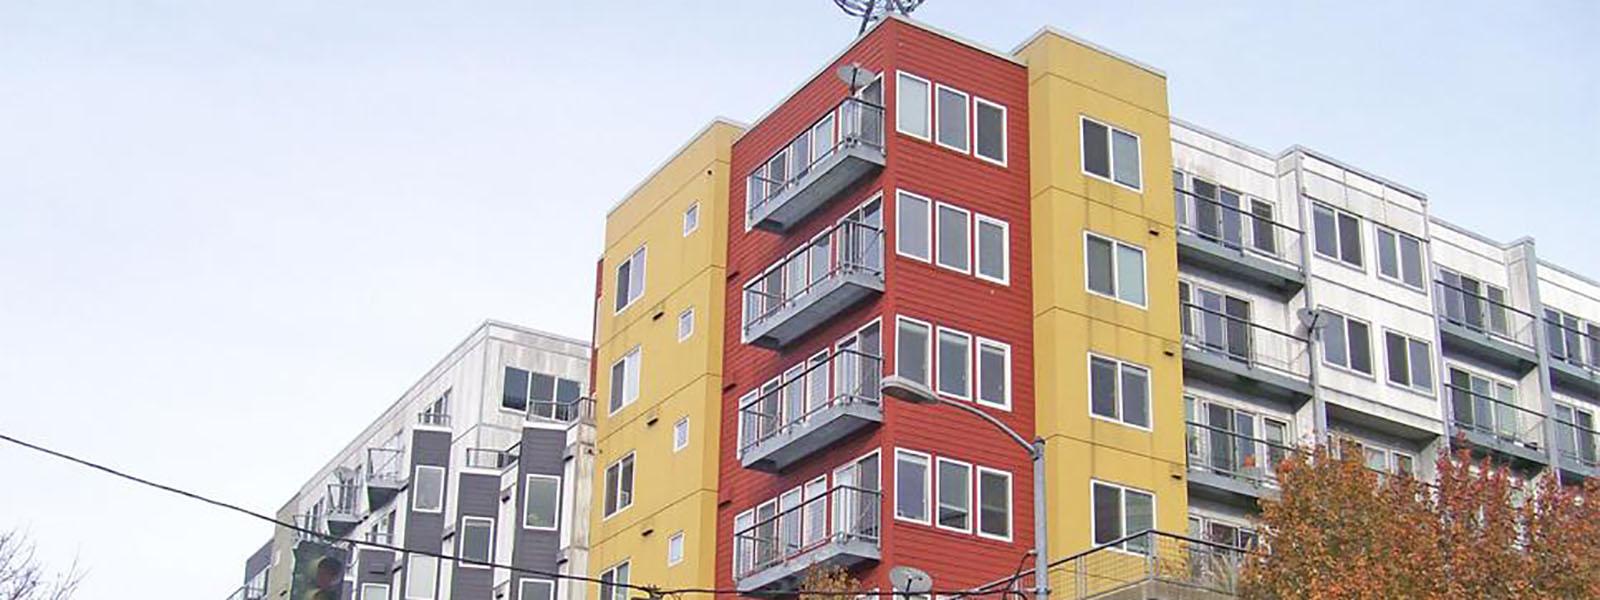 Site 17 Condominiums - Pike Place, Seattle, Washington